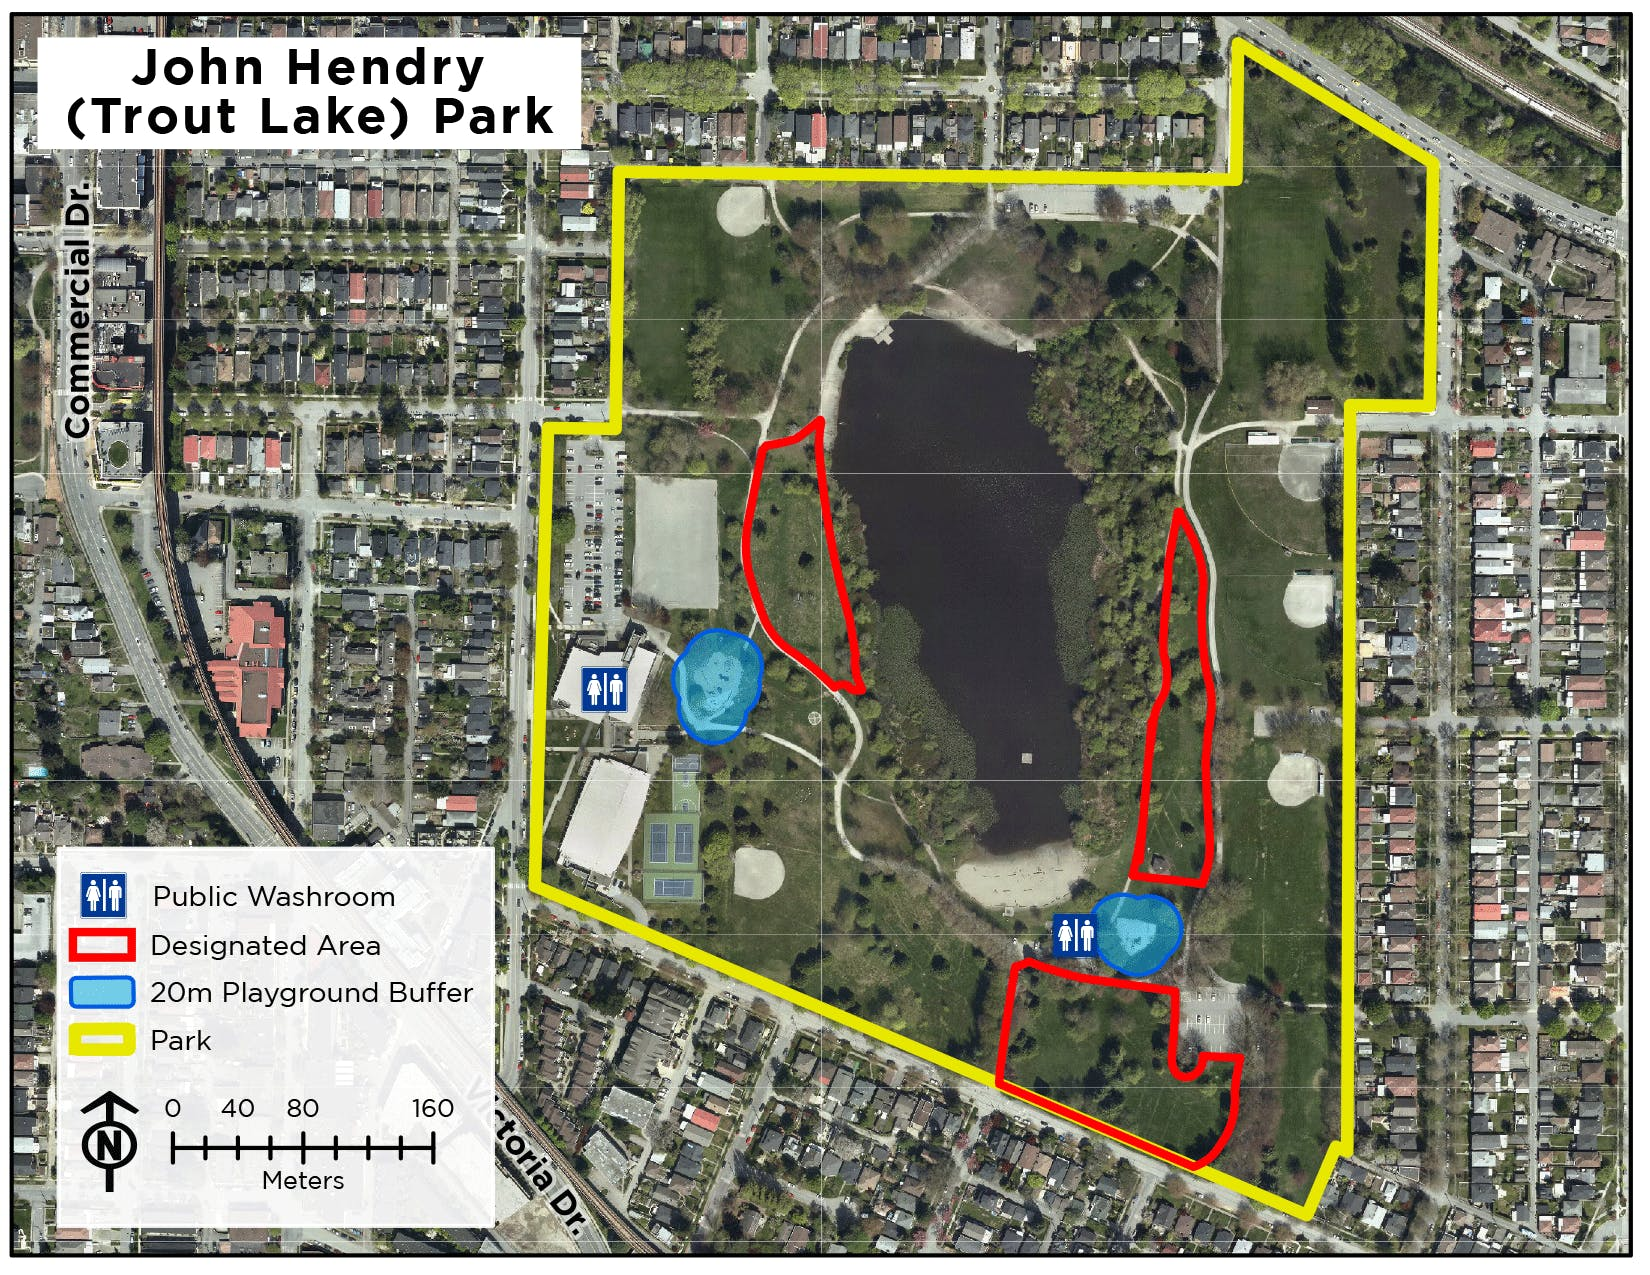 John Hendry (Trout Lake) Park